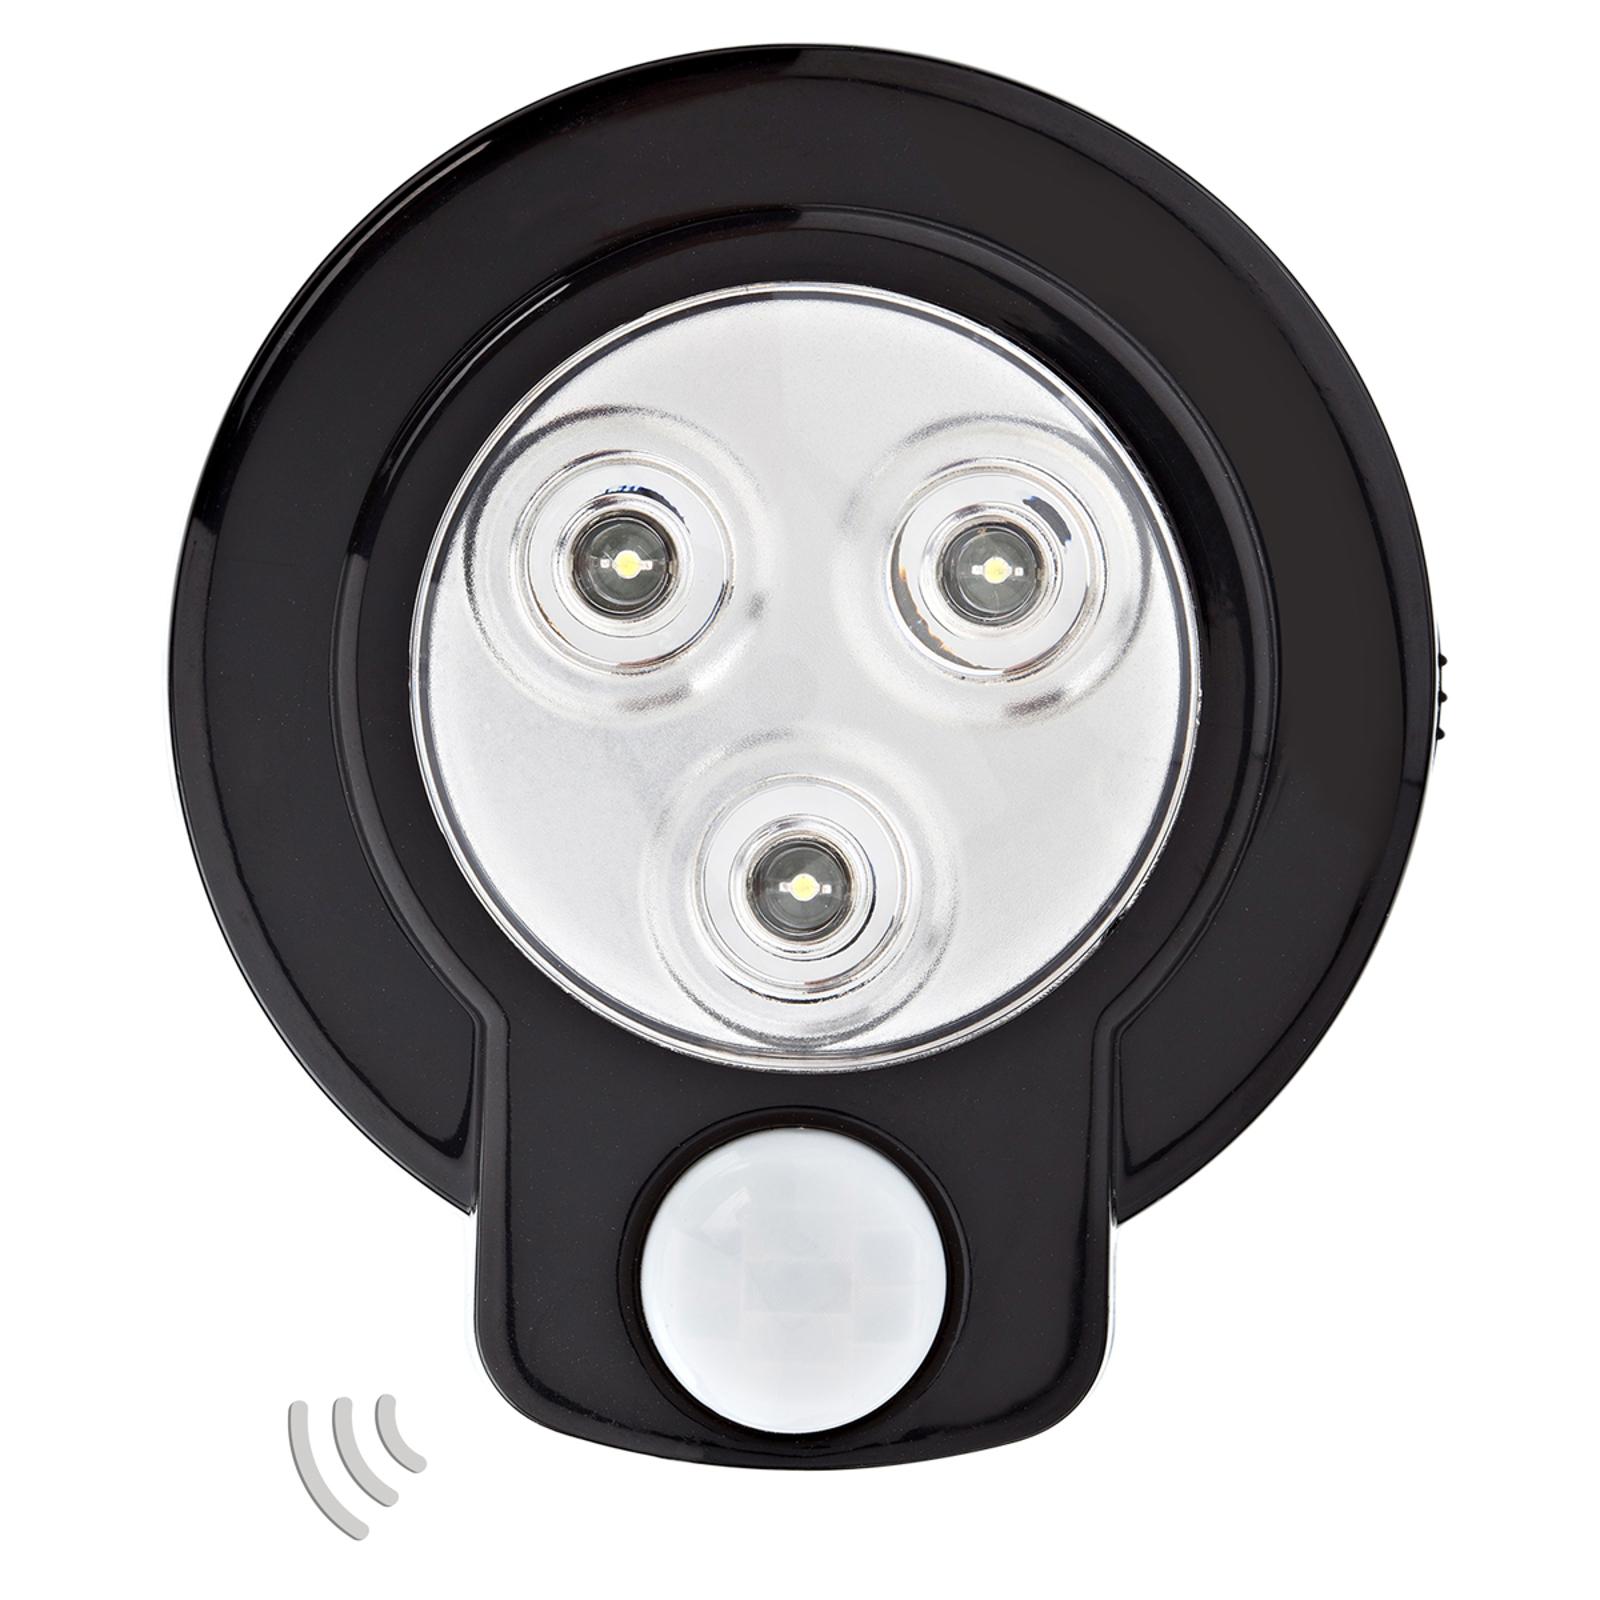 Nightlight Flex Sensor - natlampe, batteridrevet